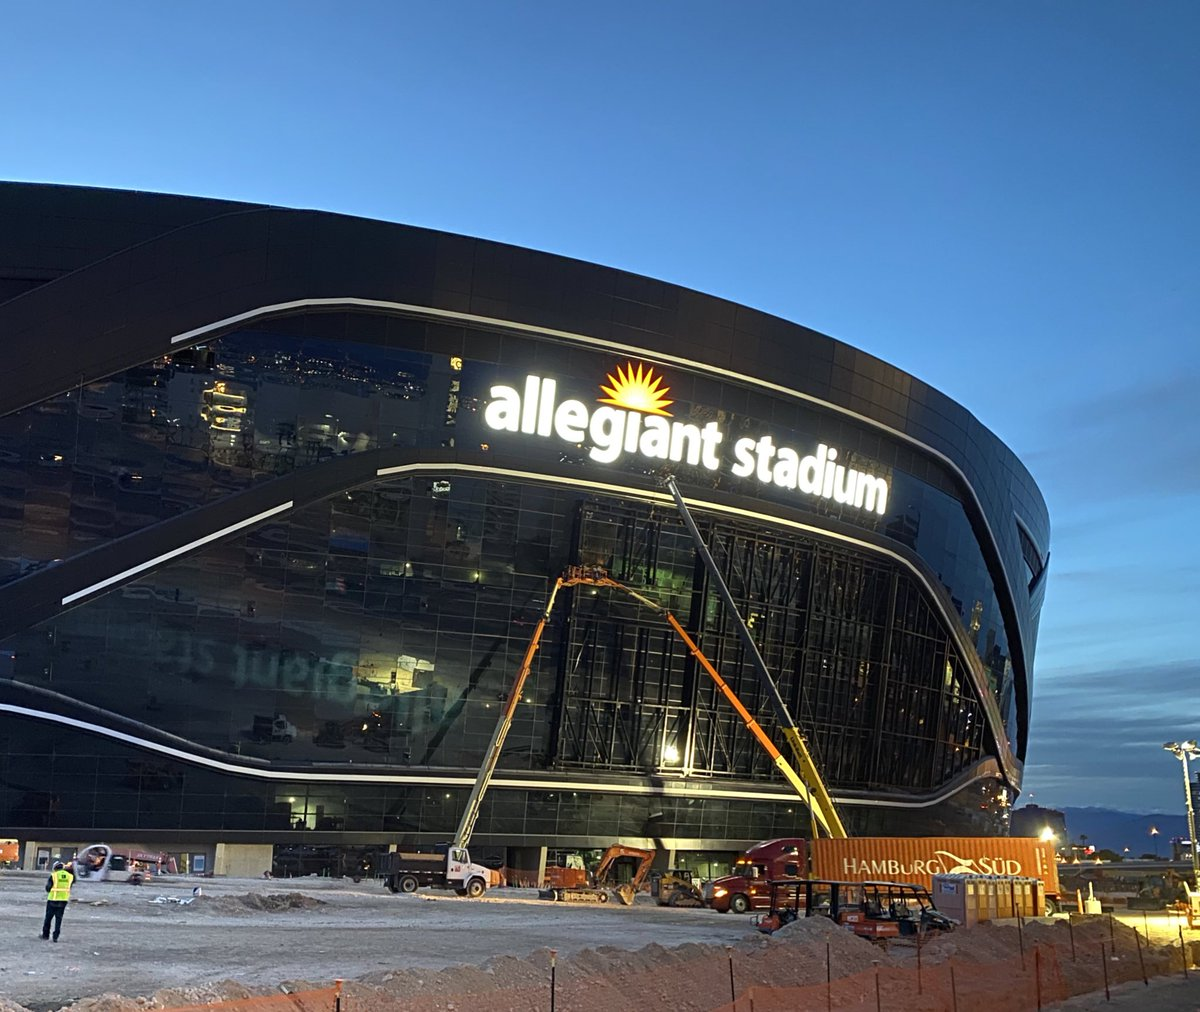 Crews testing the lights on 2 of the Allegiant Stadium signs installed on the $2 billion, 65,000 seat stadium. #vegas #raiders #stadiumpic.twitter.com/nY8n95nt3w